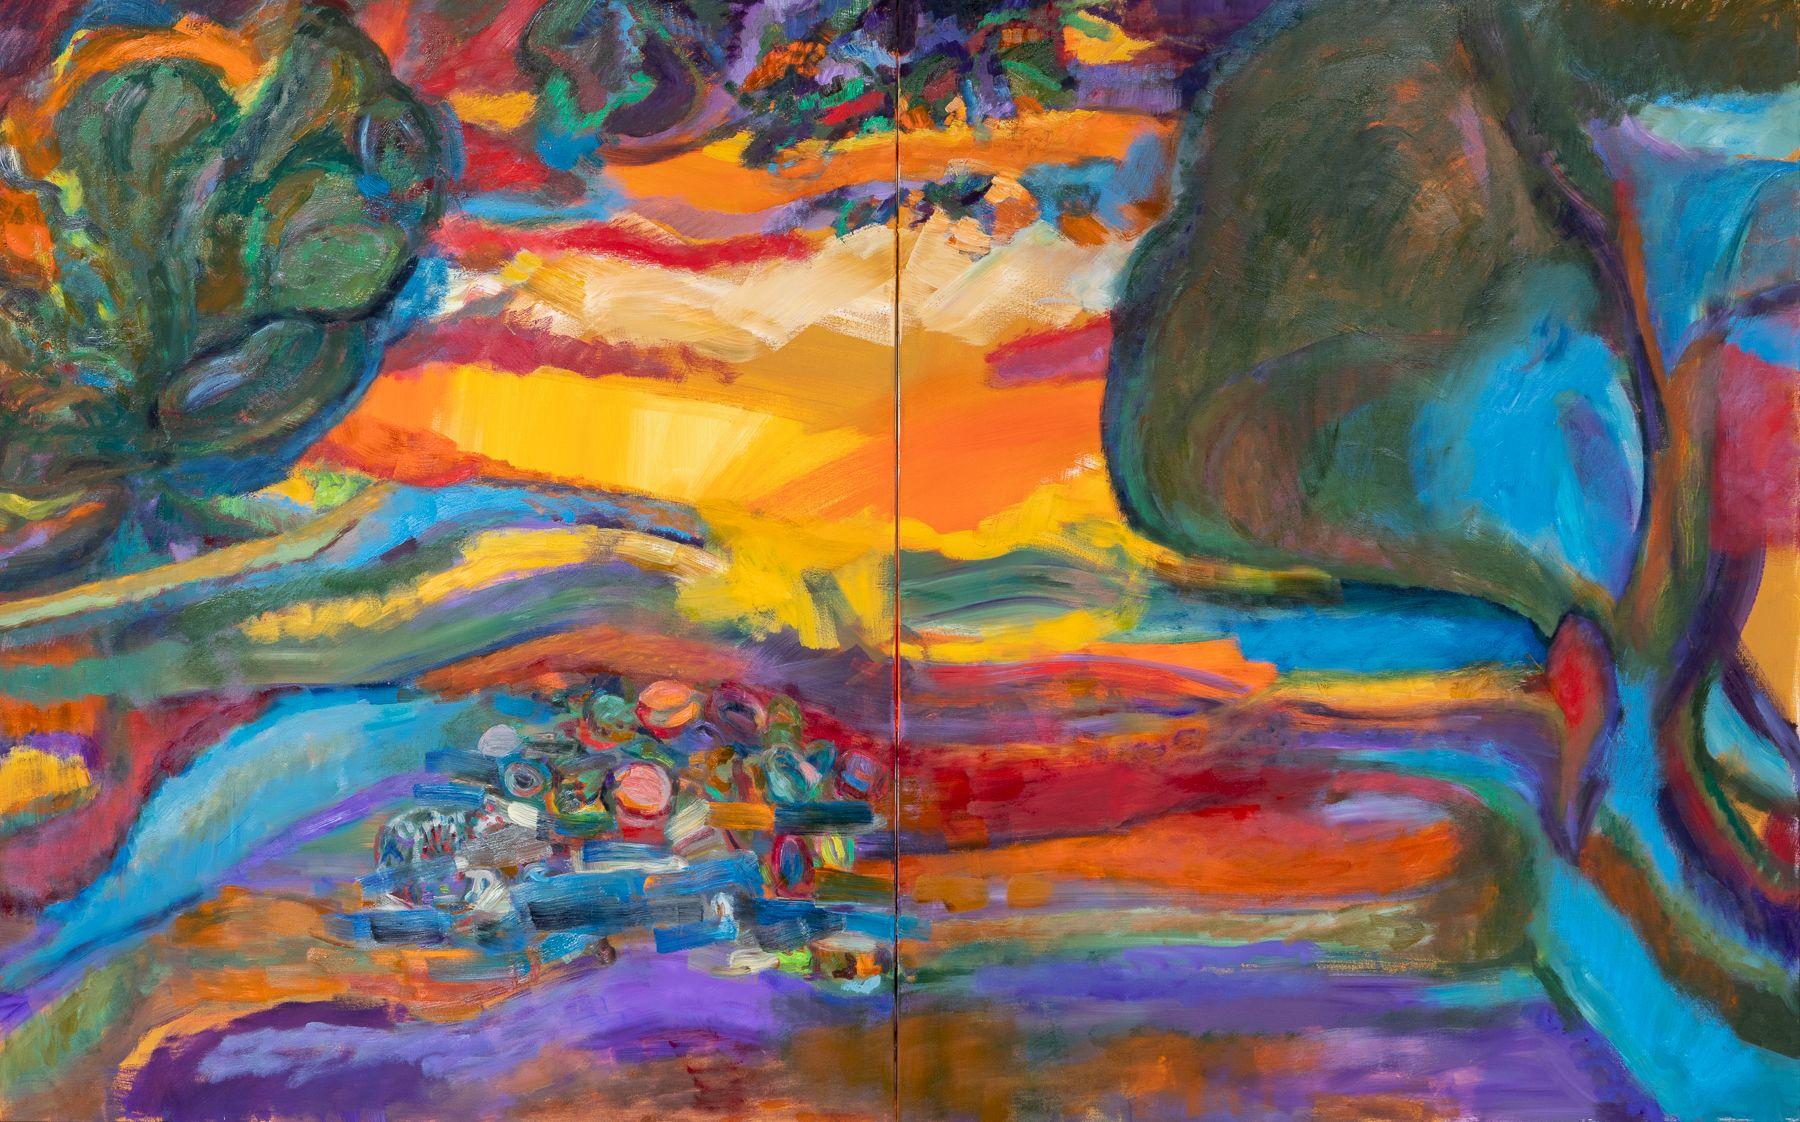 Retreating Light or Four-Cornered Shade, Gina Rorai, 2020